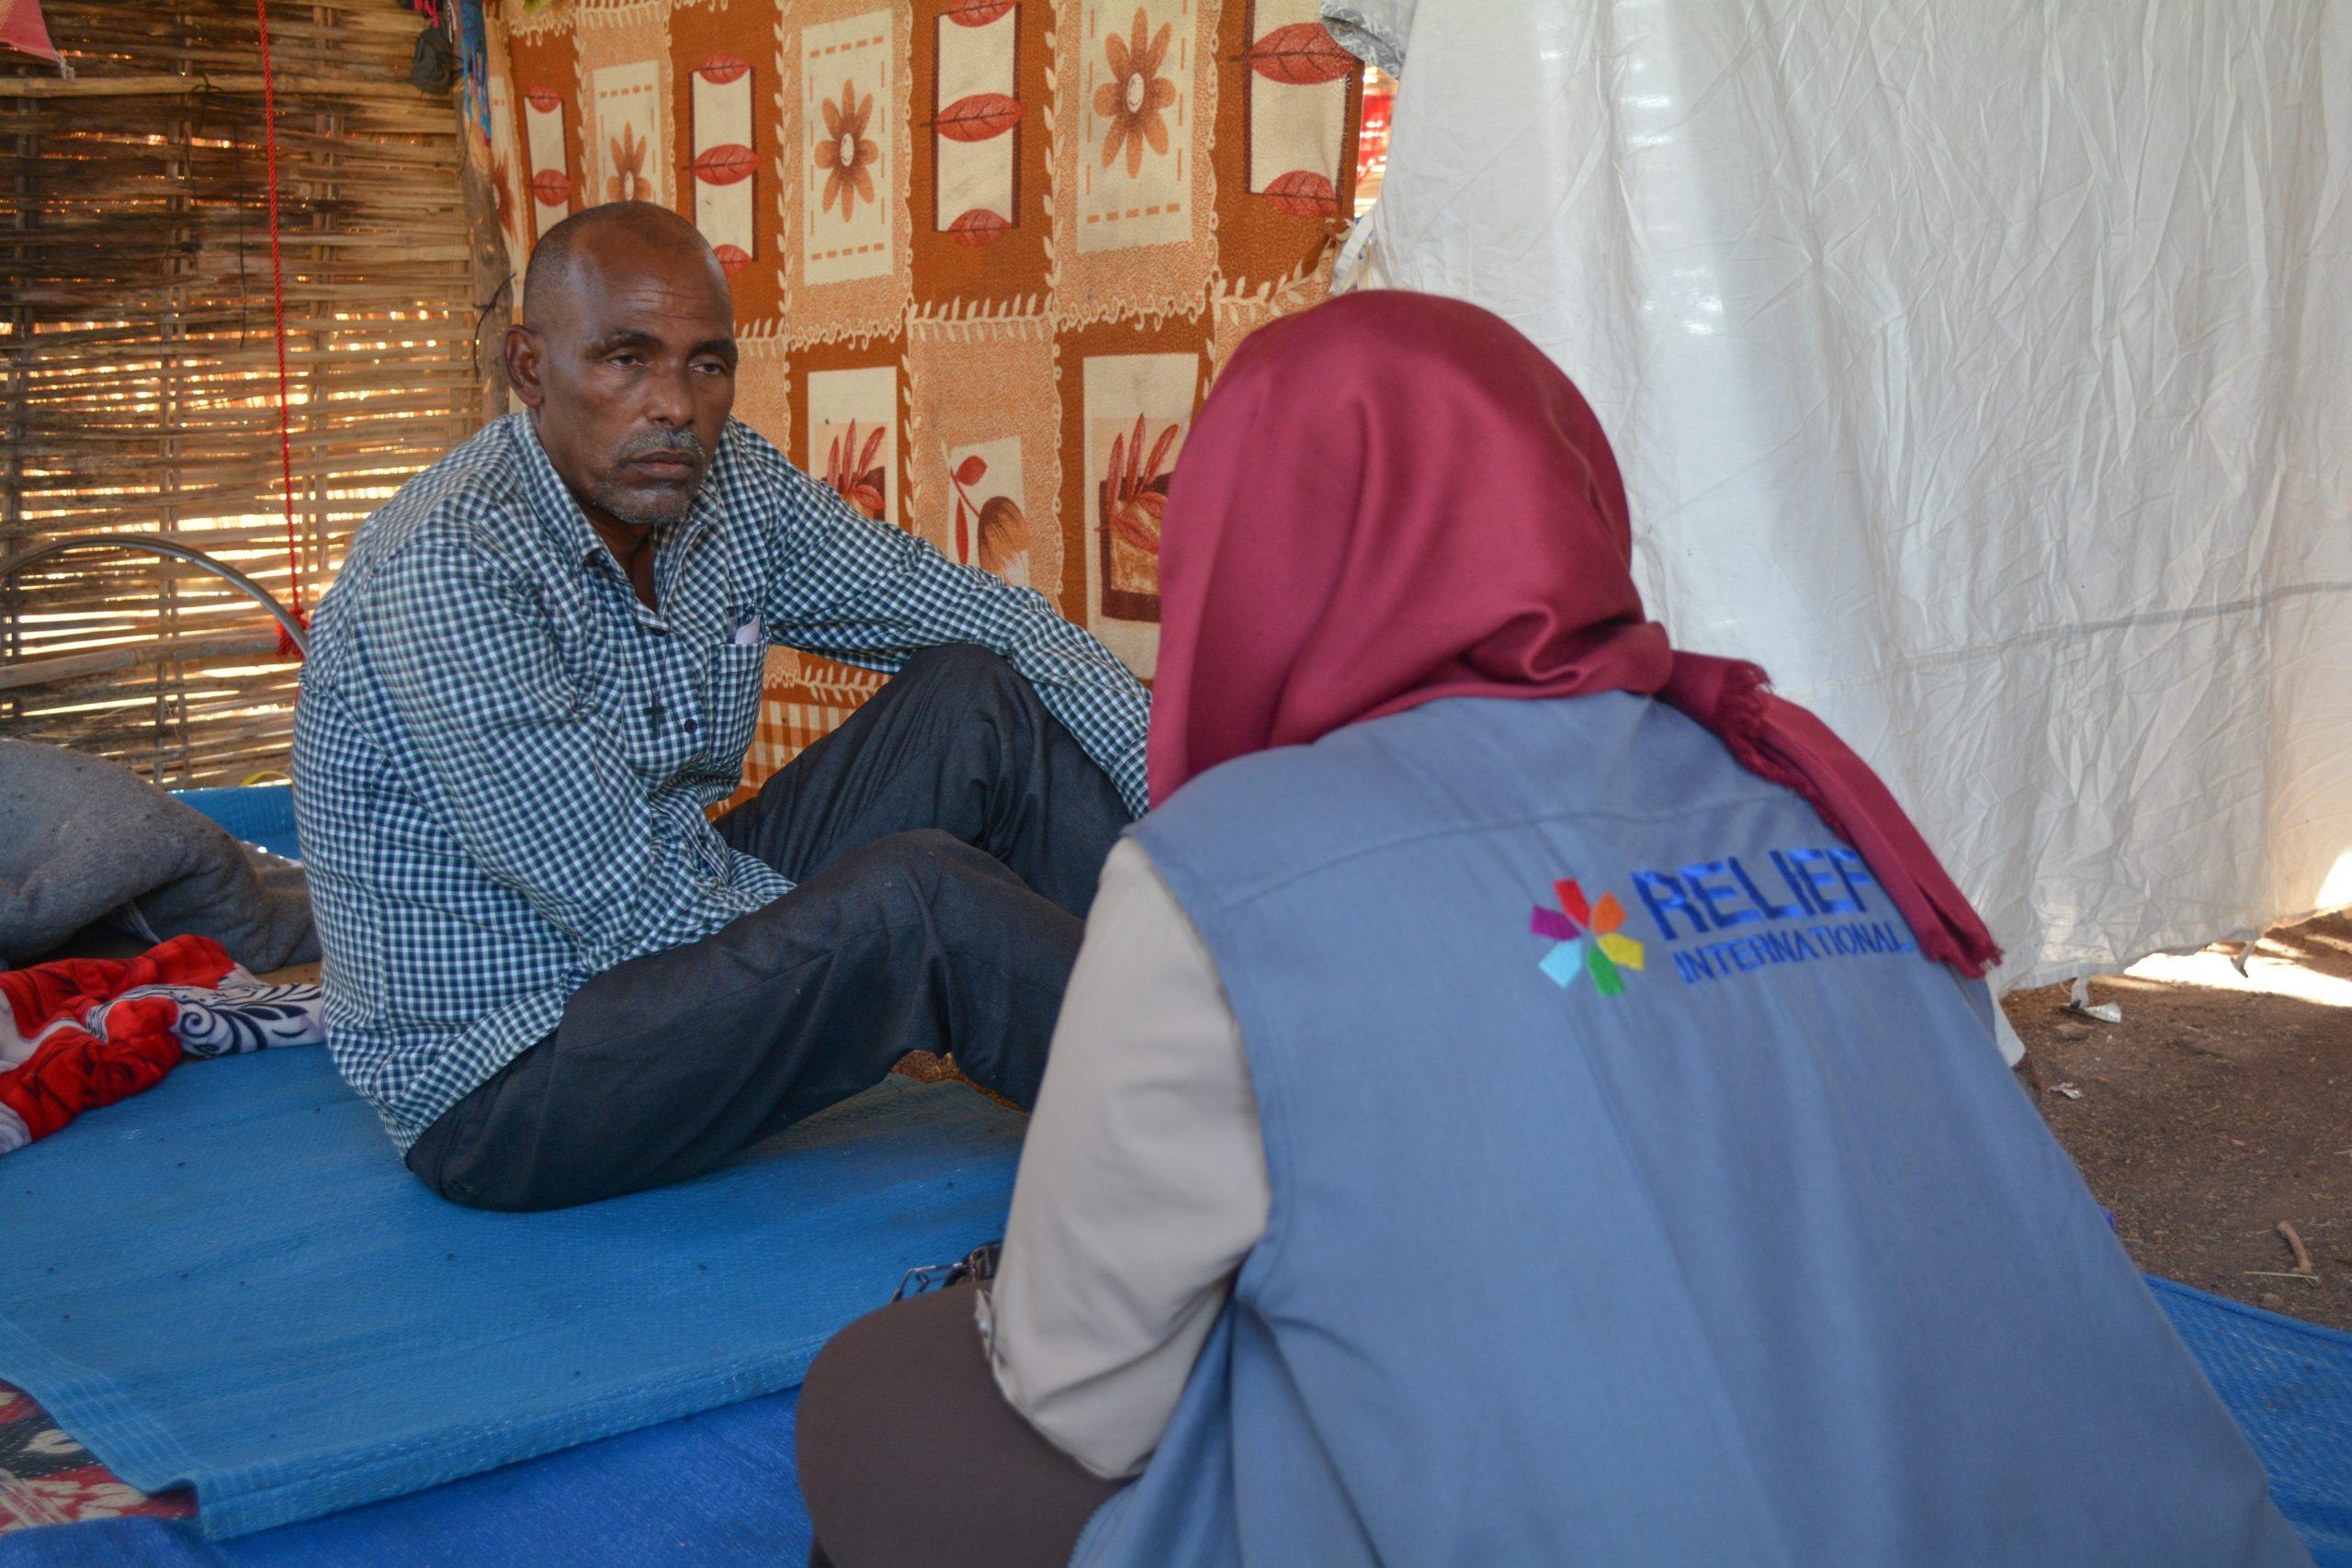 RI-Staff-Meeting-with-the-Refugee-Population-in-Um-Rakuba-scaled.jpg